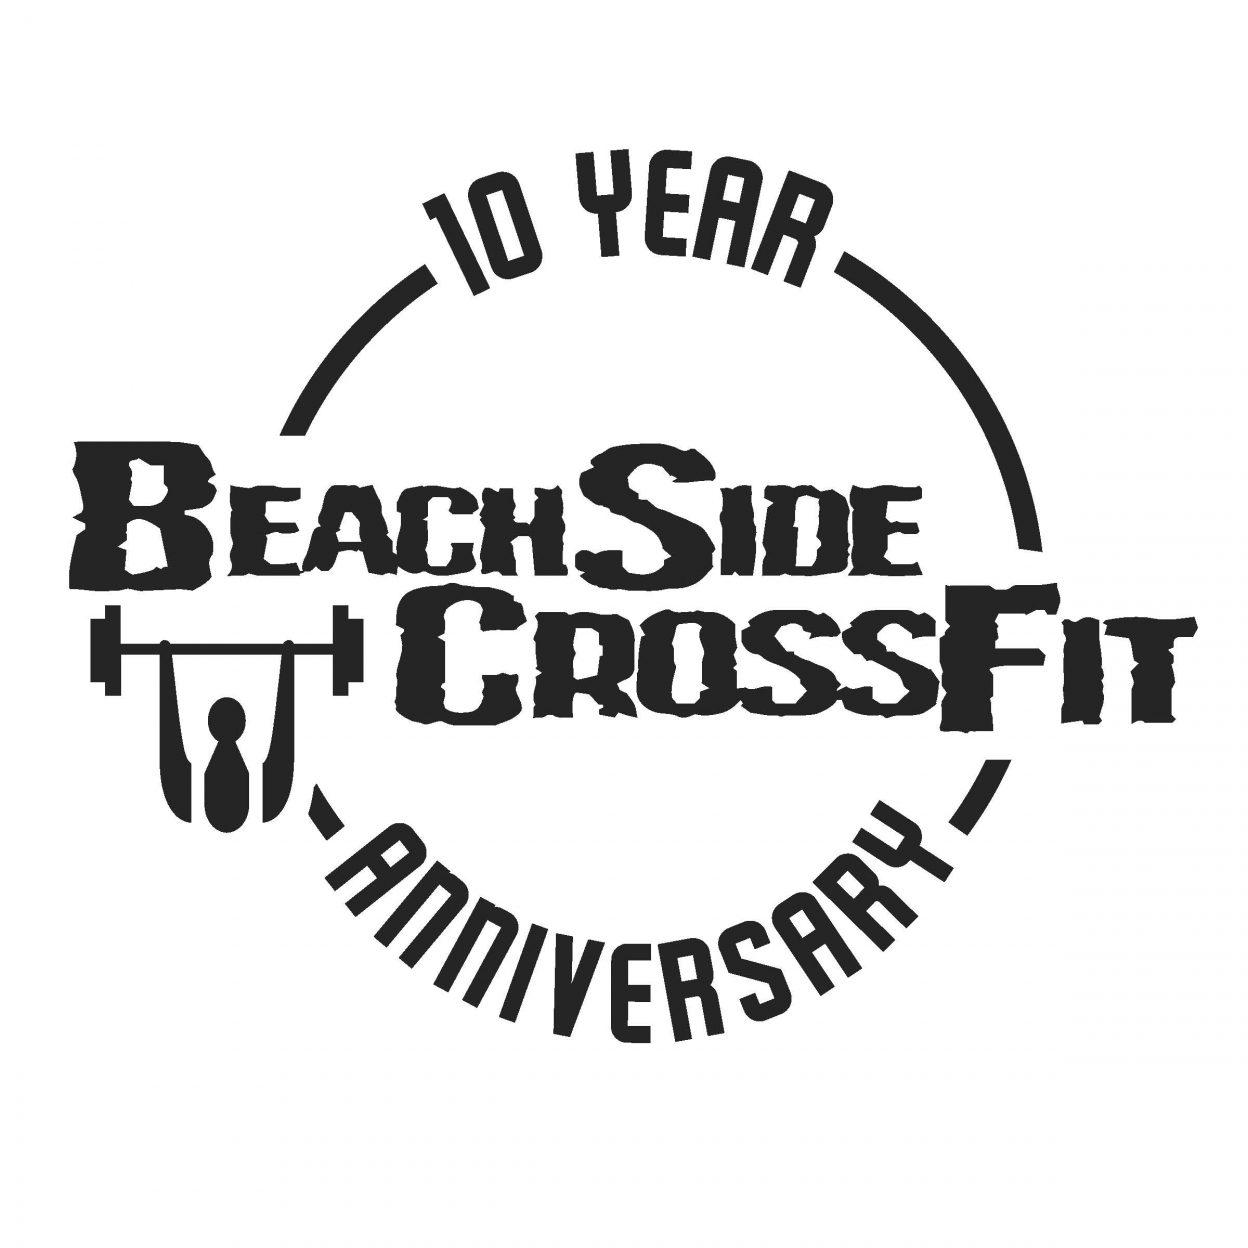 BeachSide CrossFit